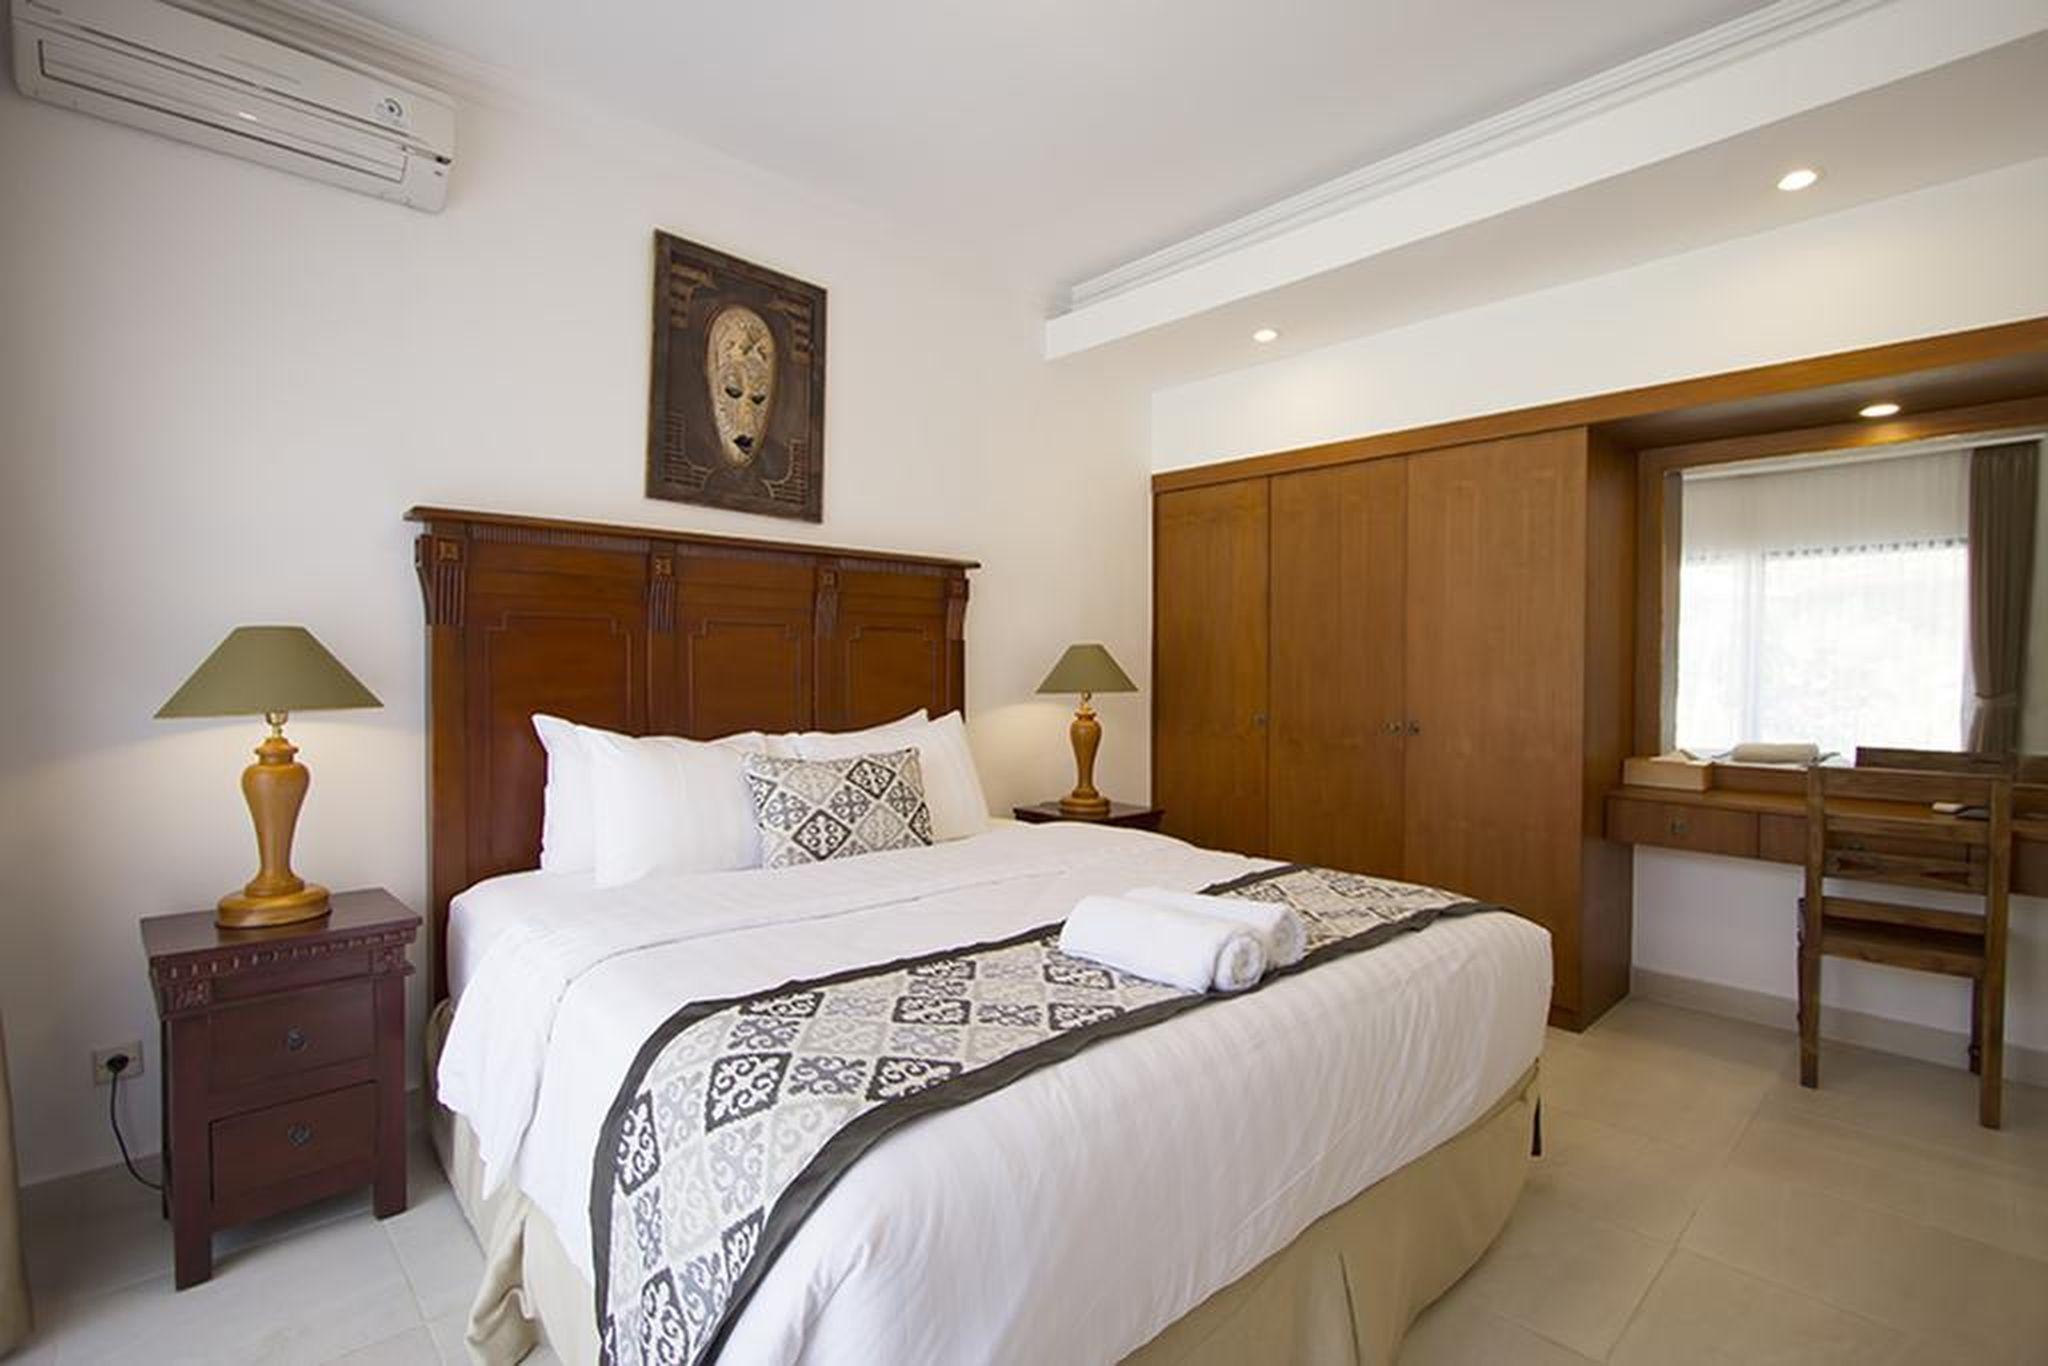 Bali Pradise Villas With 3BR Closes GWK